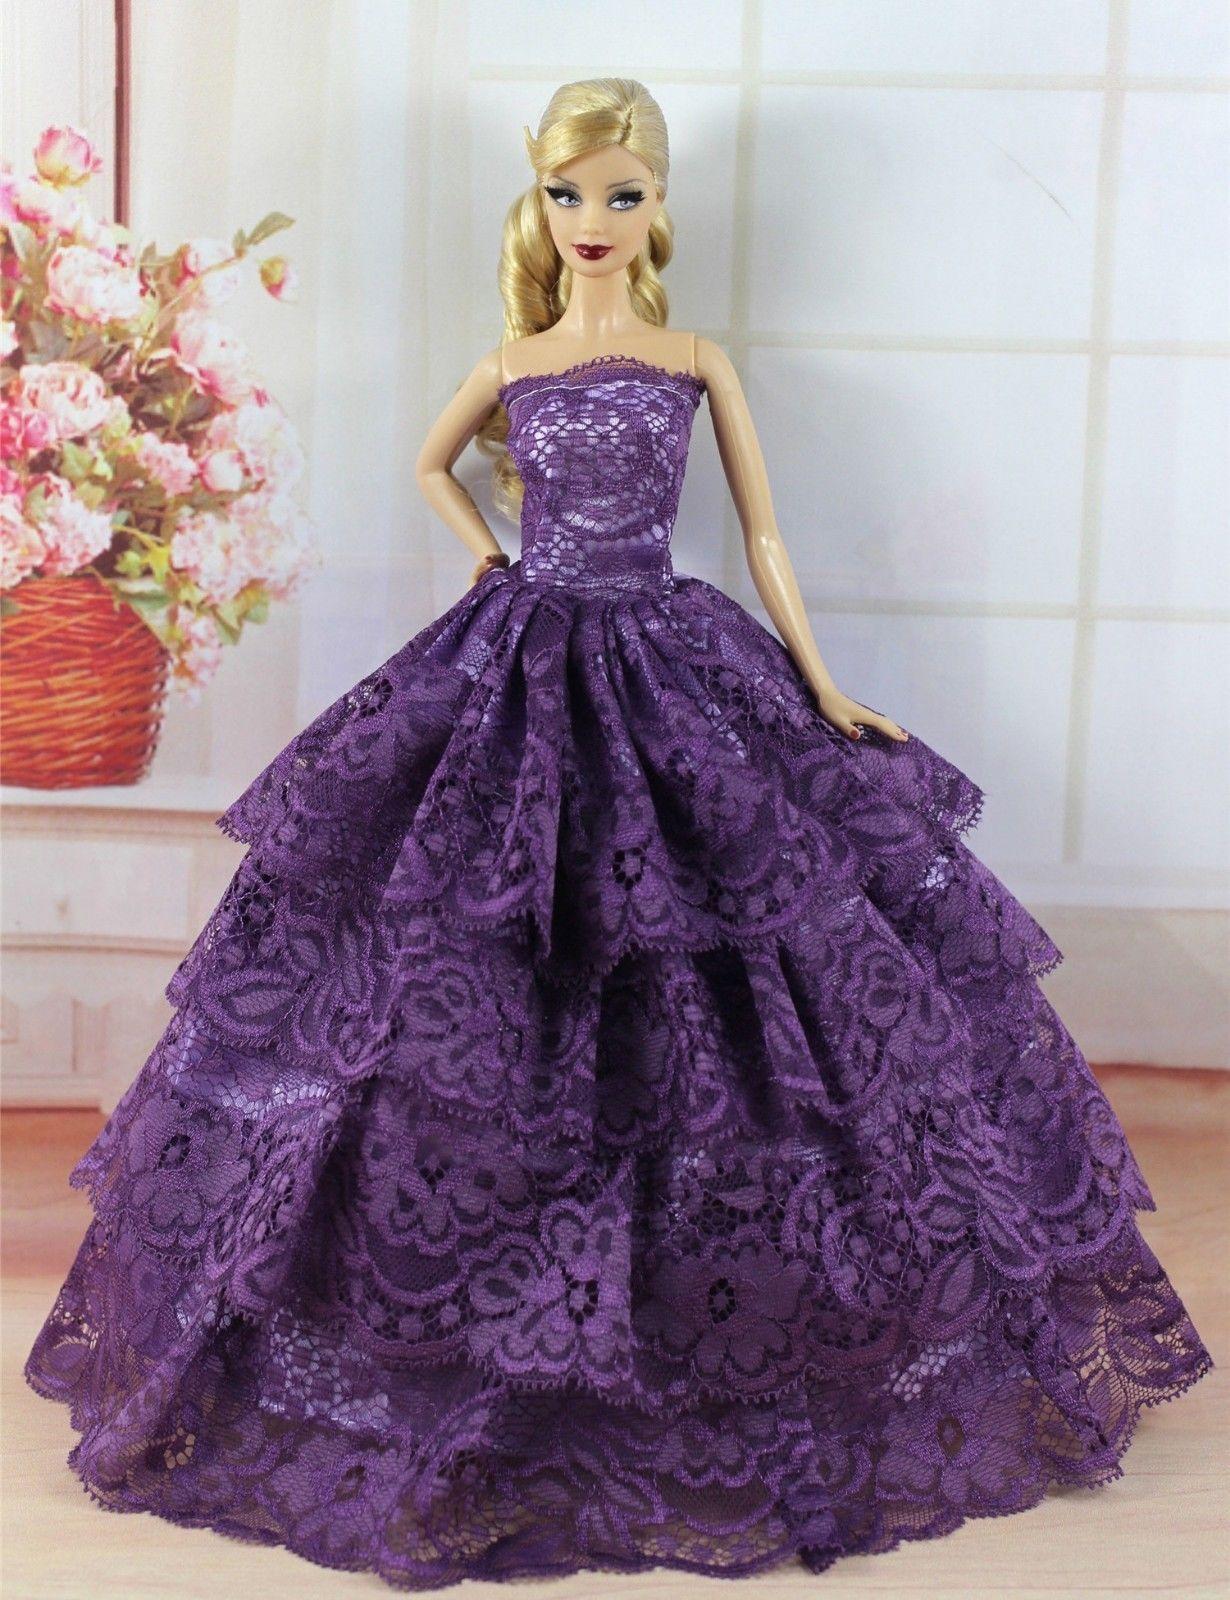 6 PCS Fashion Princes Dress/Wedding Clothes/Gown For Barbie Doll S288